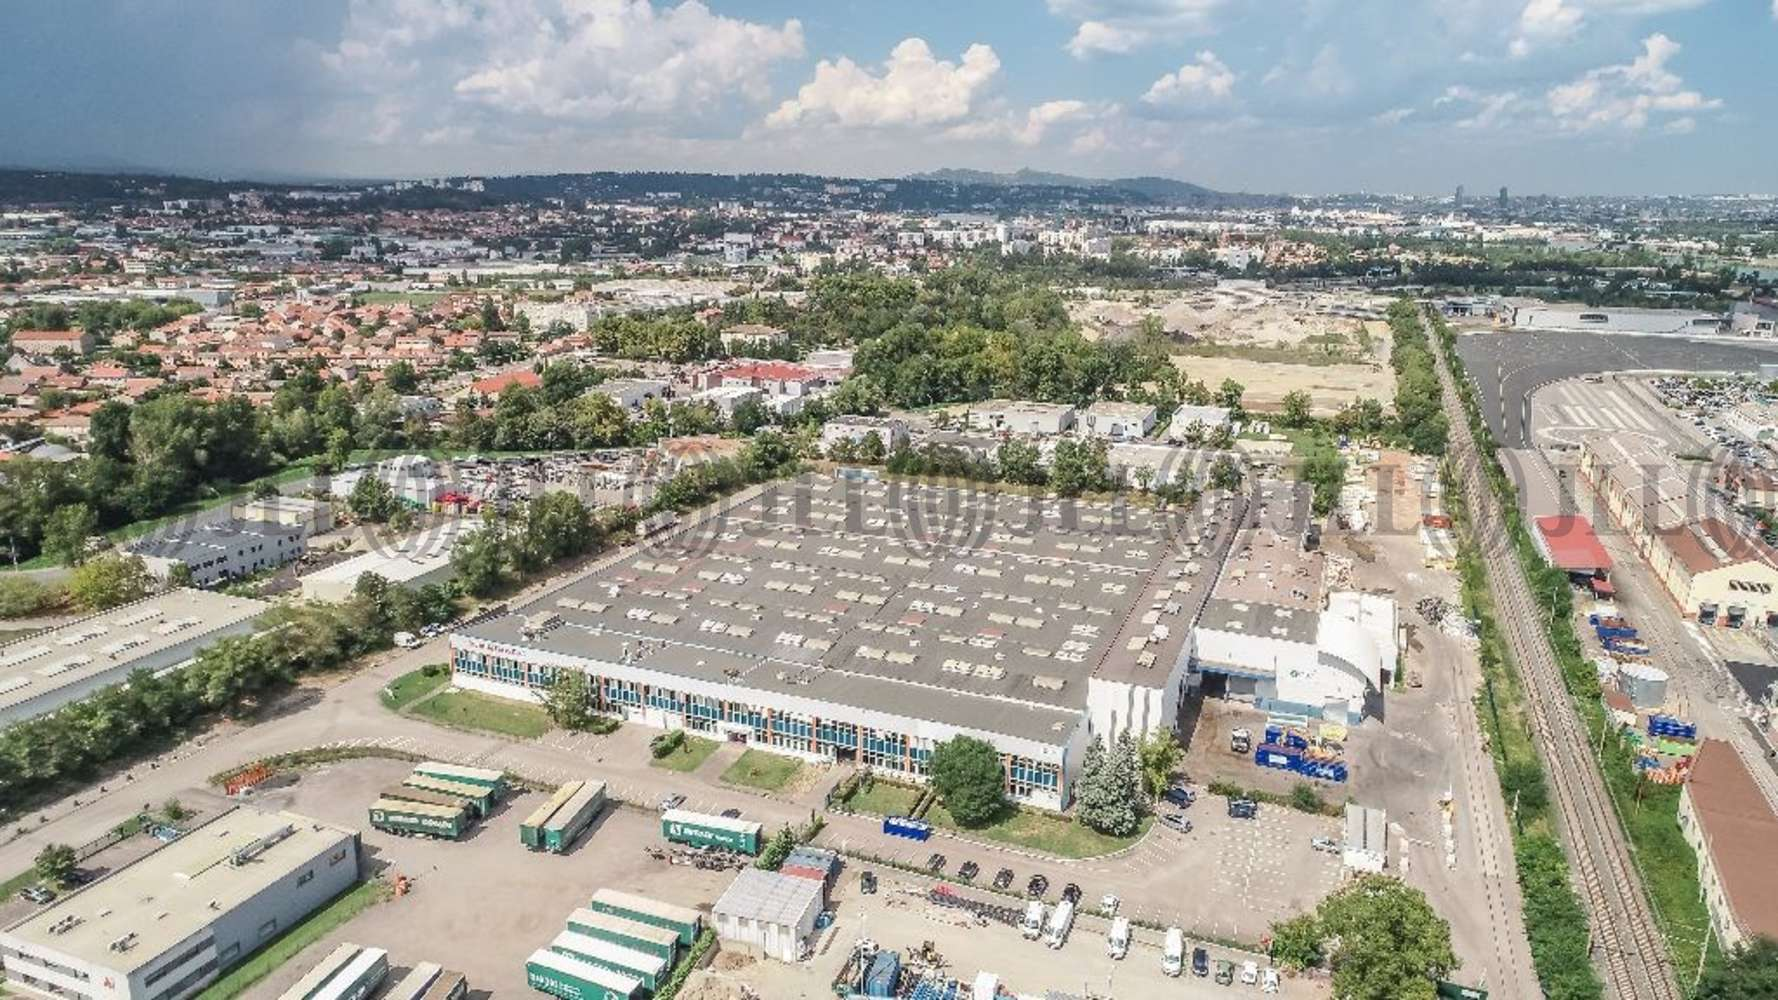 Plateformes logistiques Irigny, 69540 - Entrepot à vendre Lyon Sud - Irigny - 9959536